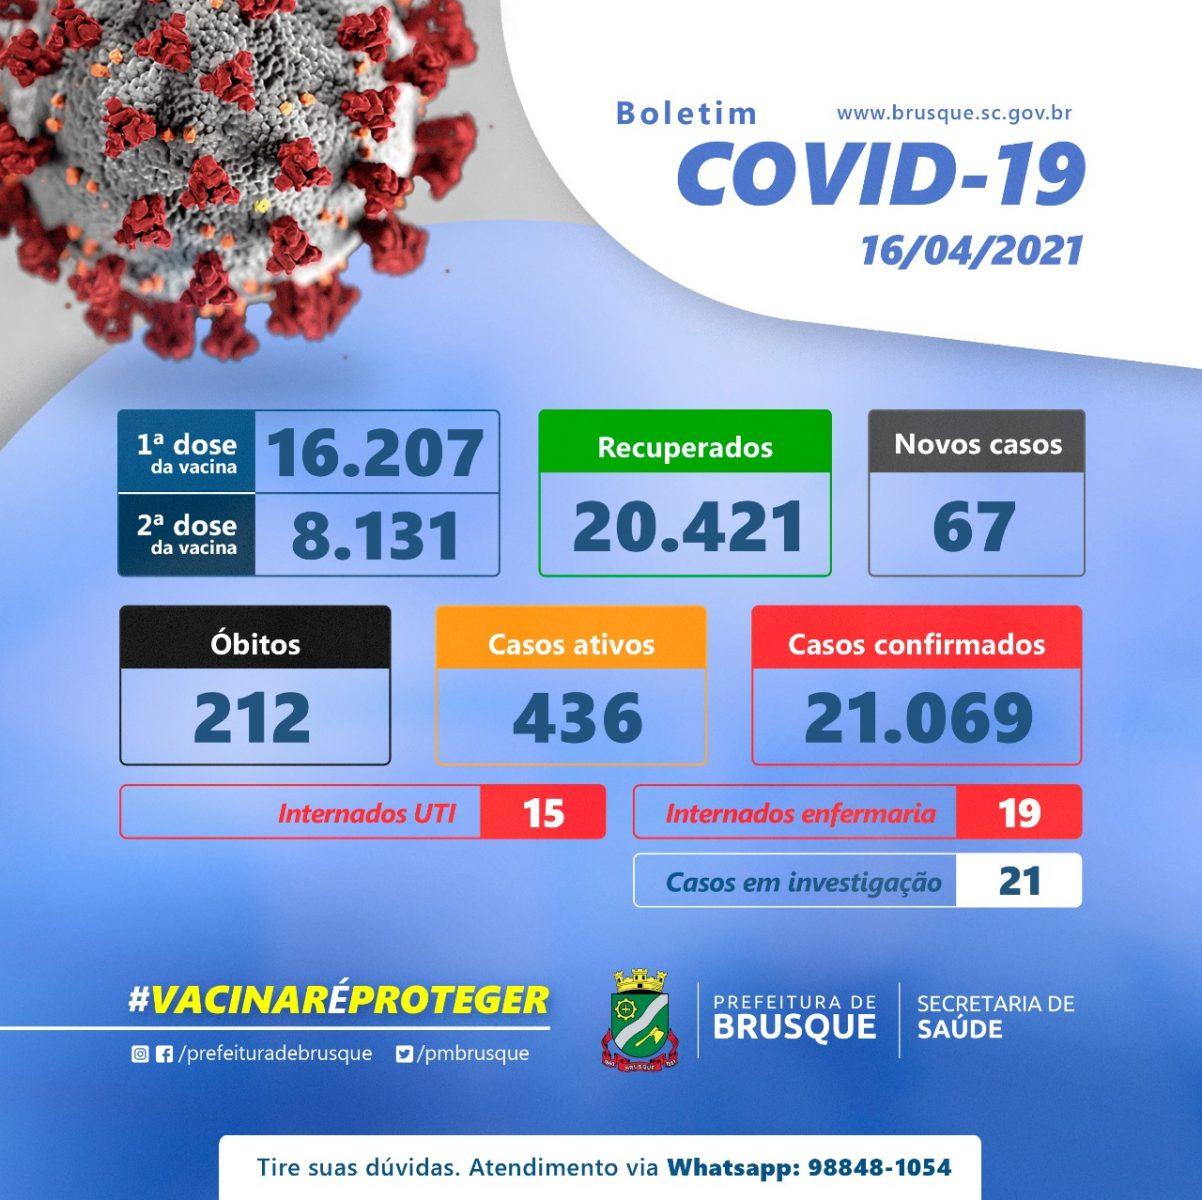 Covid 19: Confira o boletim epidemiológico desta sexta-feira (16)